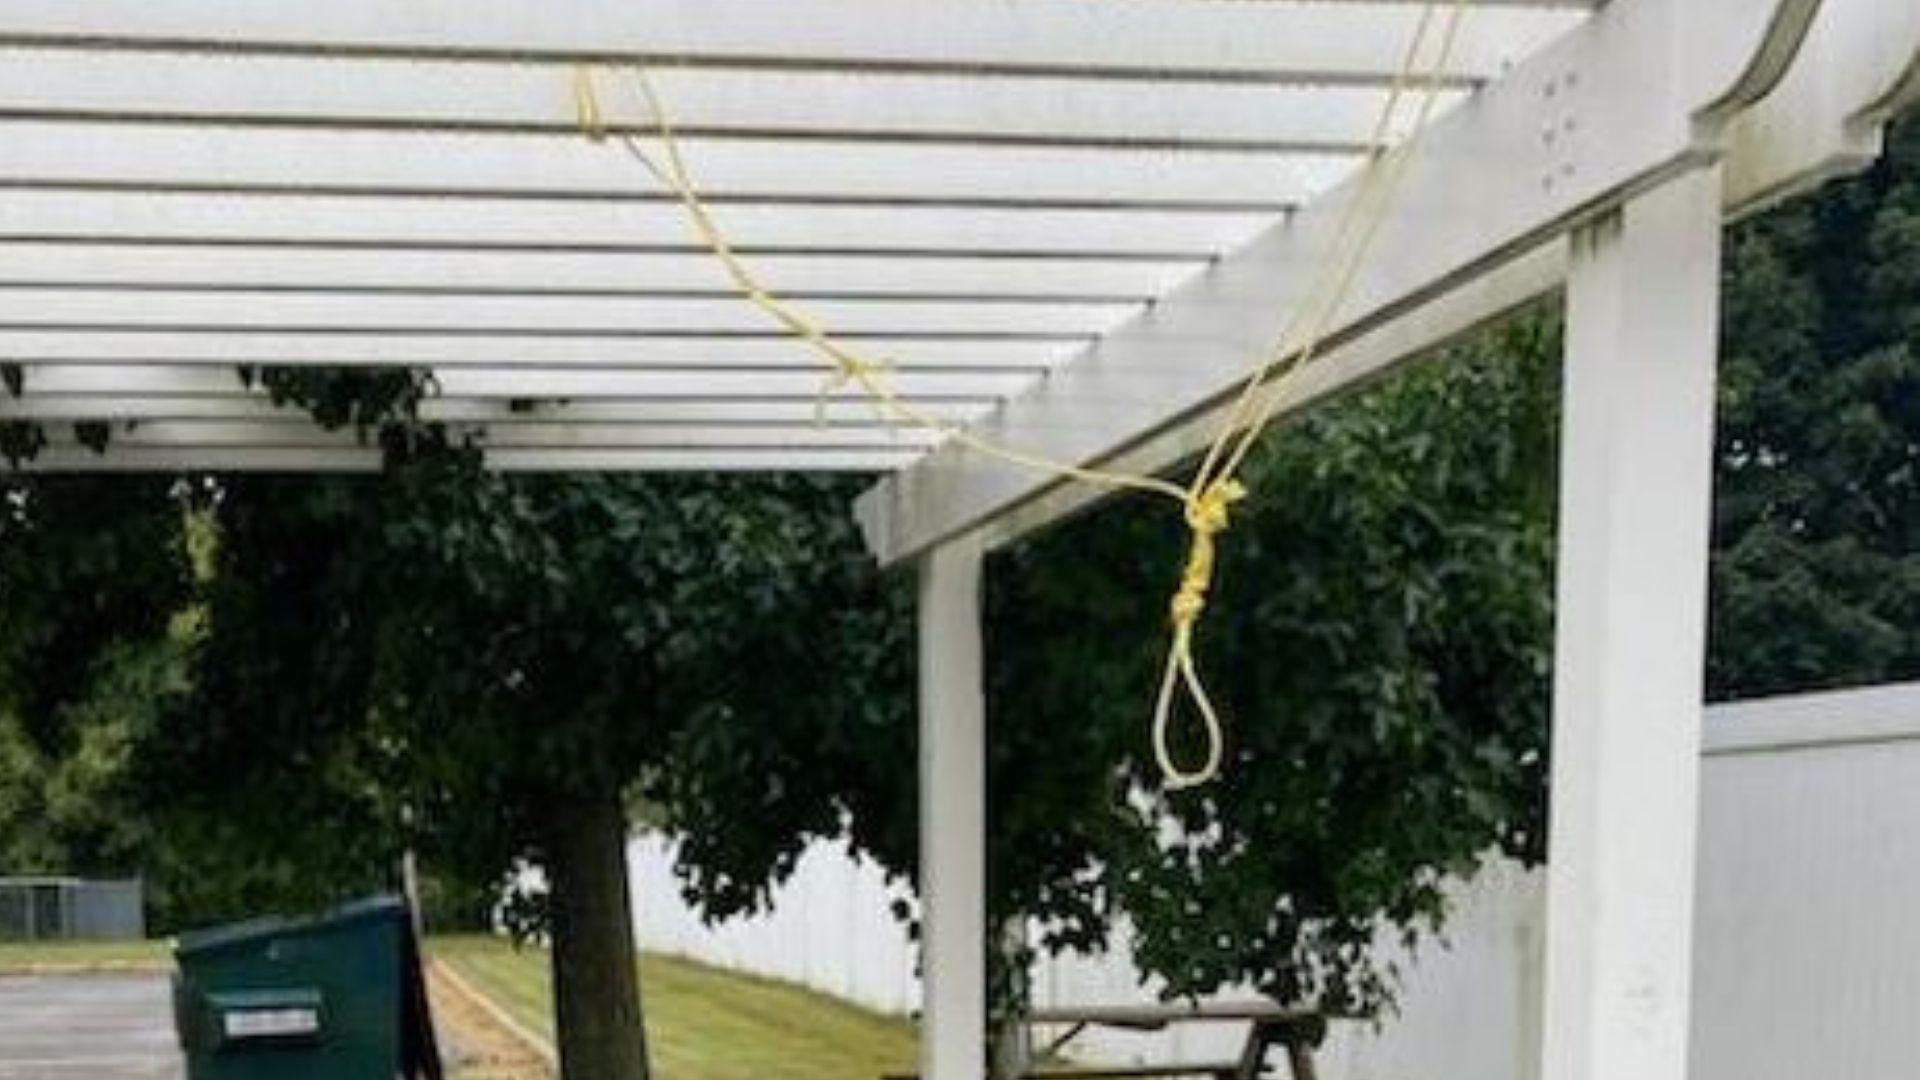 Noose found at Long Island senior center